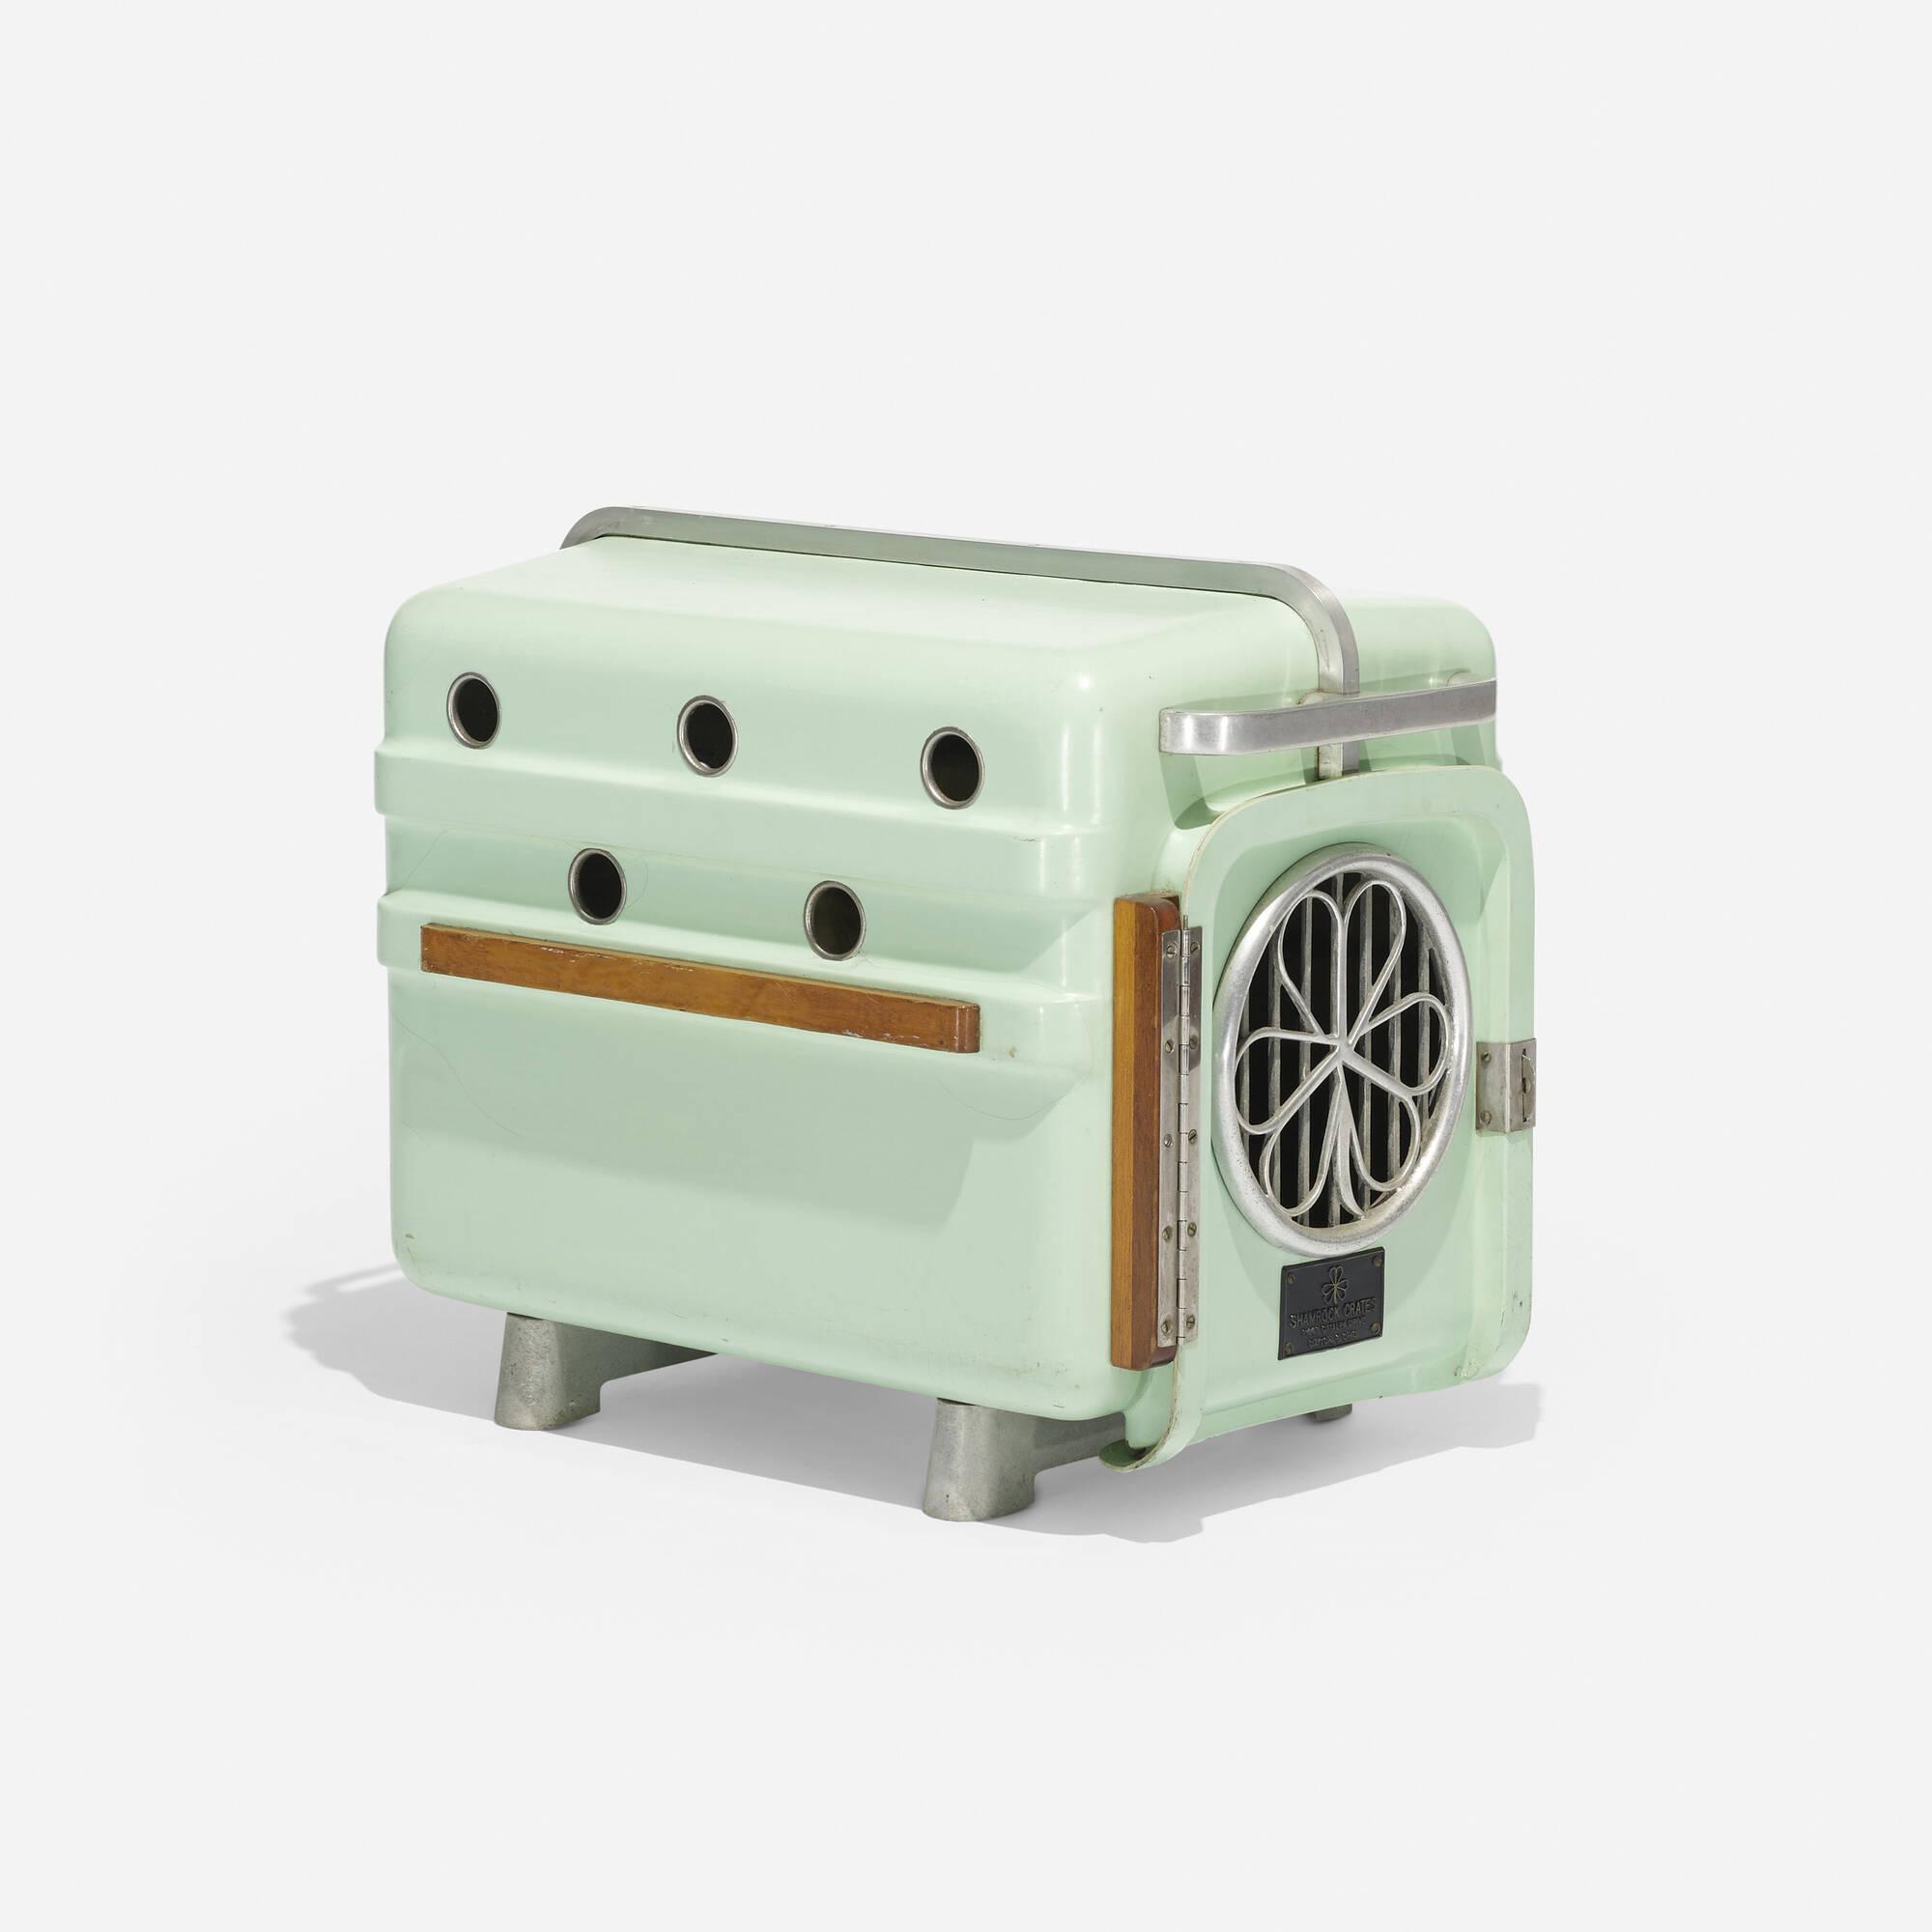 724: Shamrock Crates / pet carrier (1 of 2)